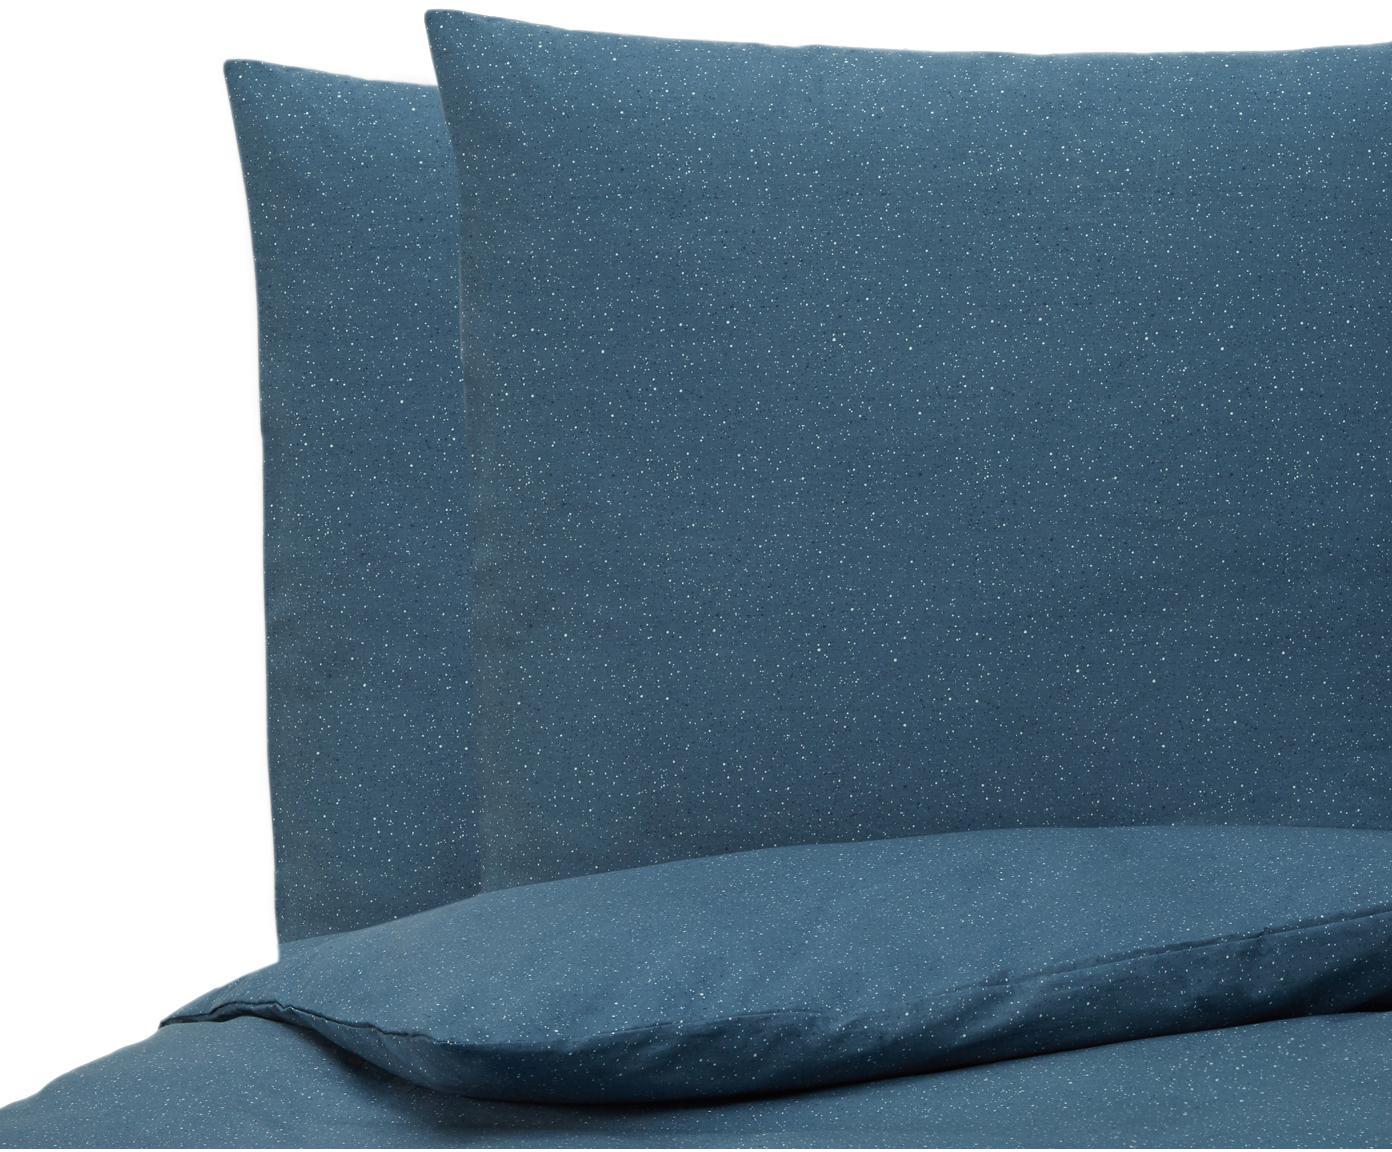 Baumwollperkal-Bettwäsche Chromite mit Sprenkel-Muster, Webart: Perkal Perkal ist ein fei, Dunkelblau, Weiß, Hellgrau, 200 x 200 cm + 2 Kissen 80 x 80 cm